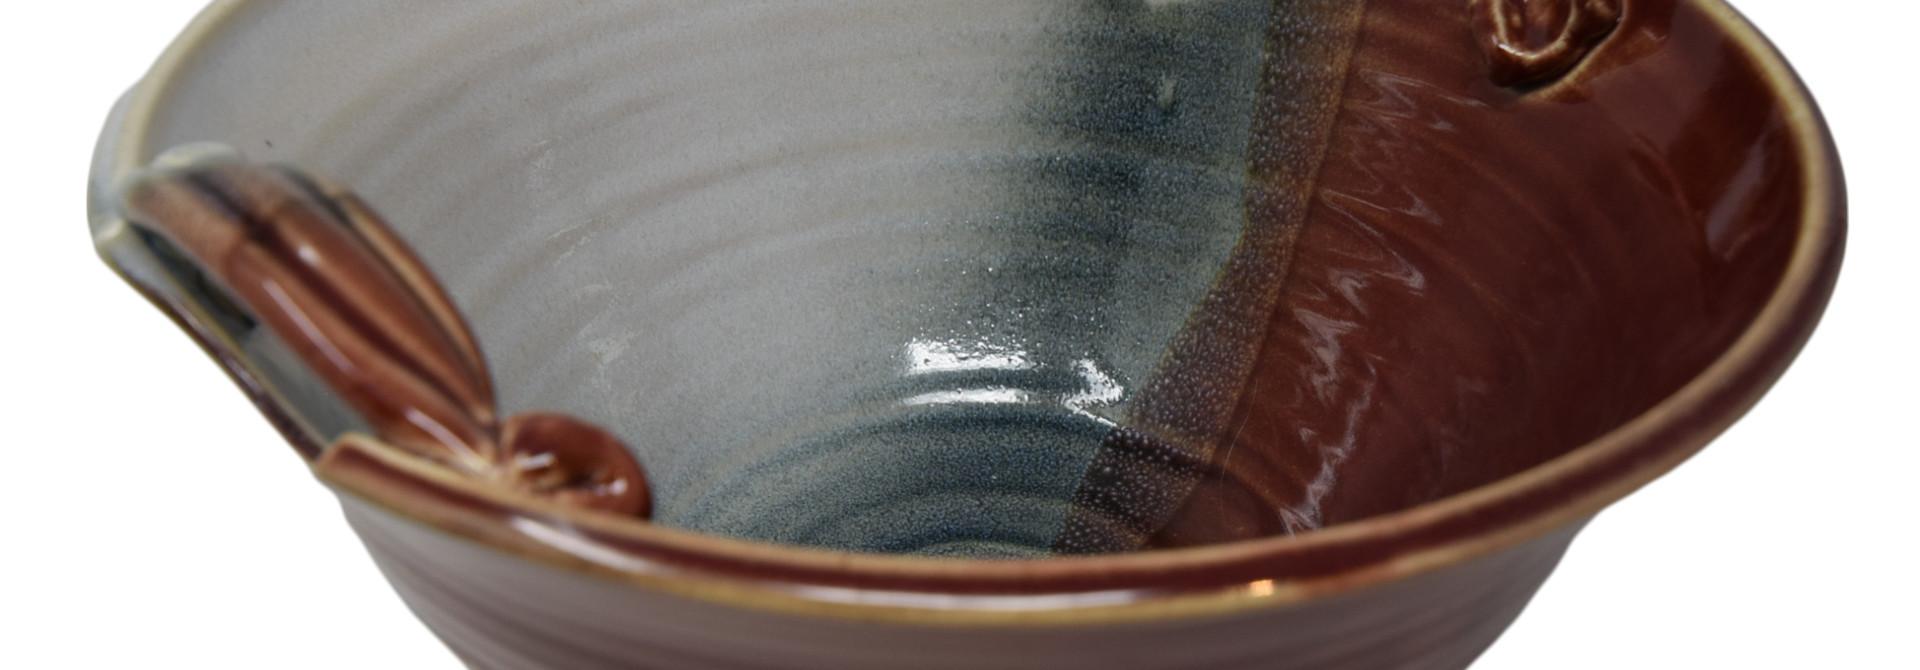 Medium Deep Bowl w/Handles